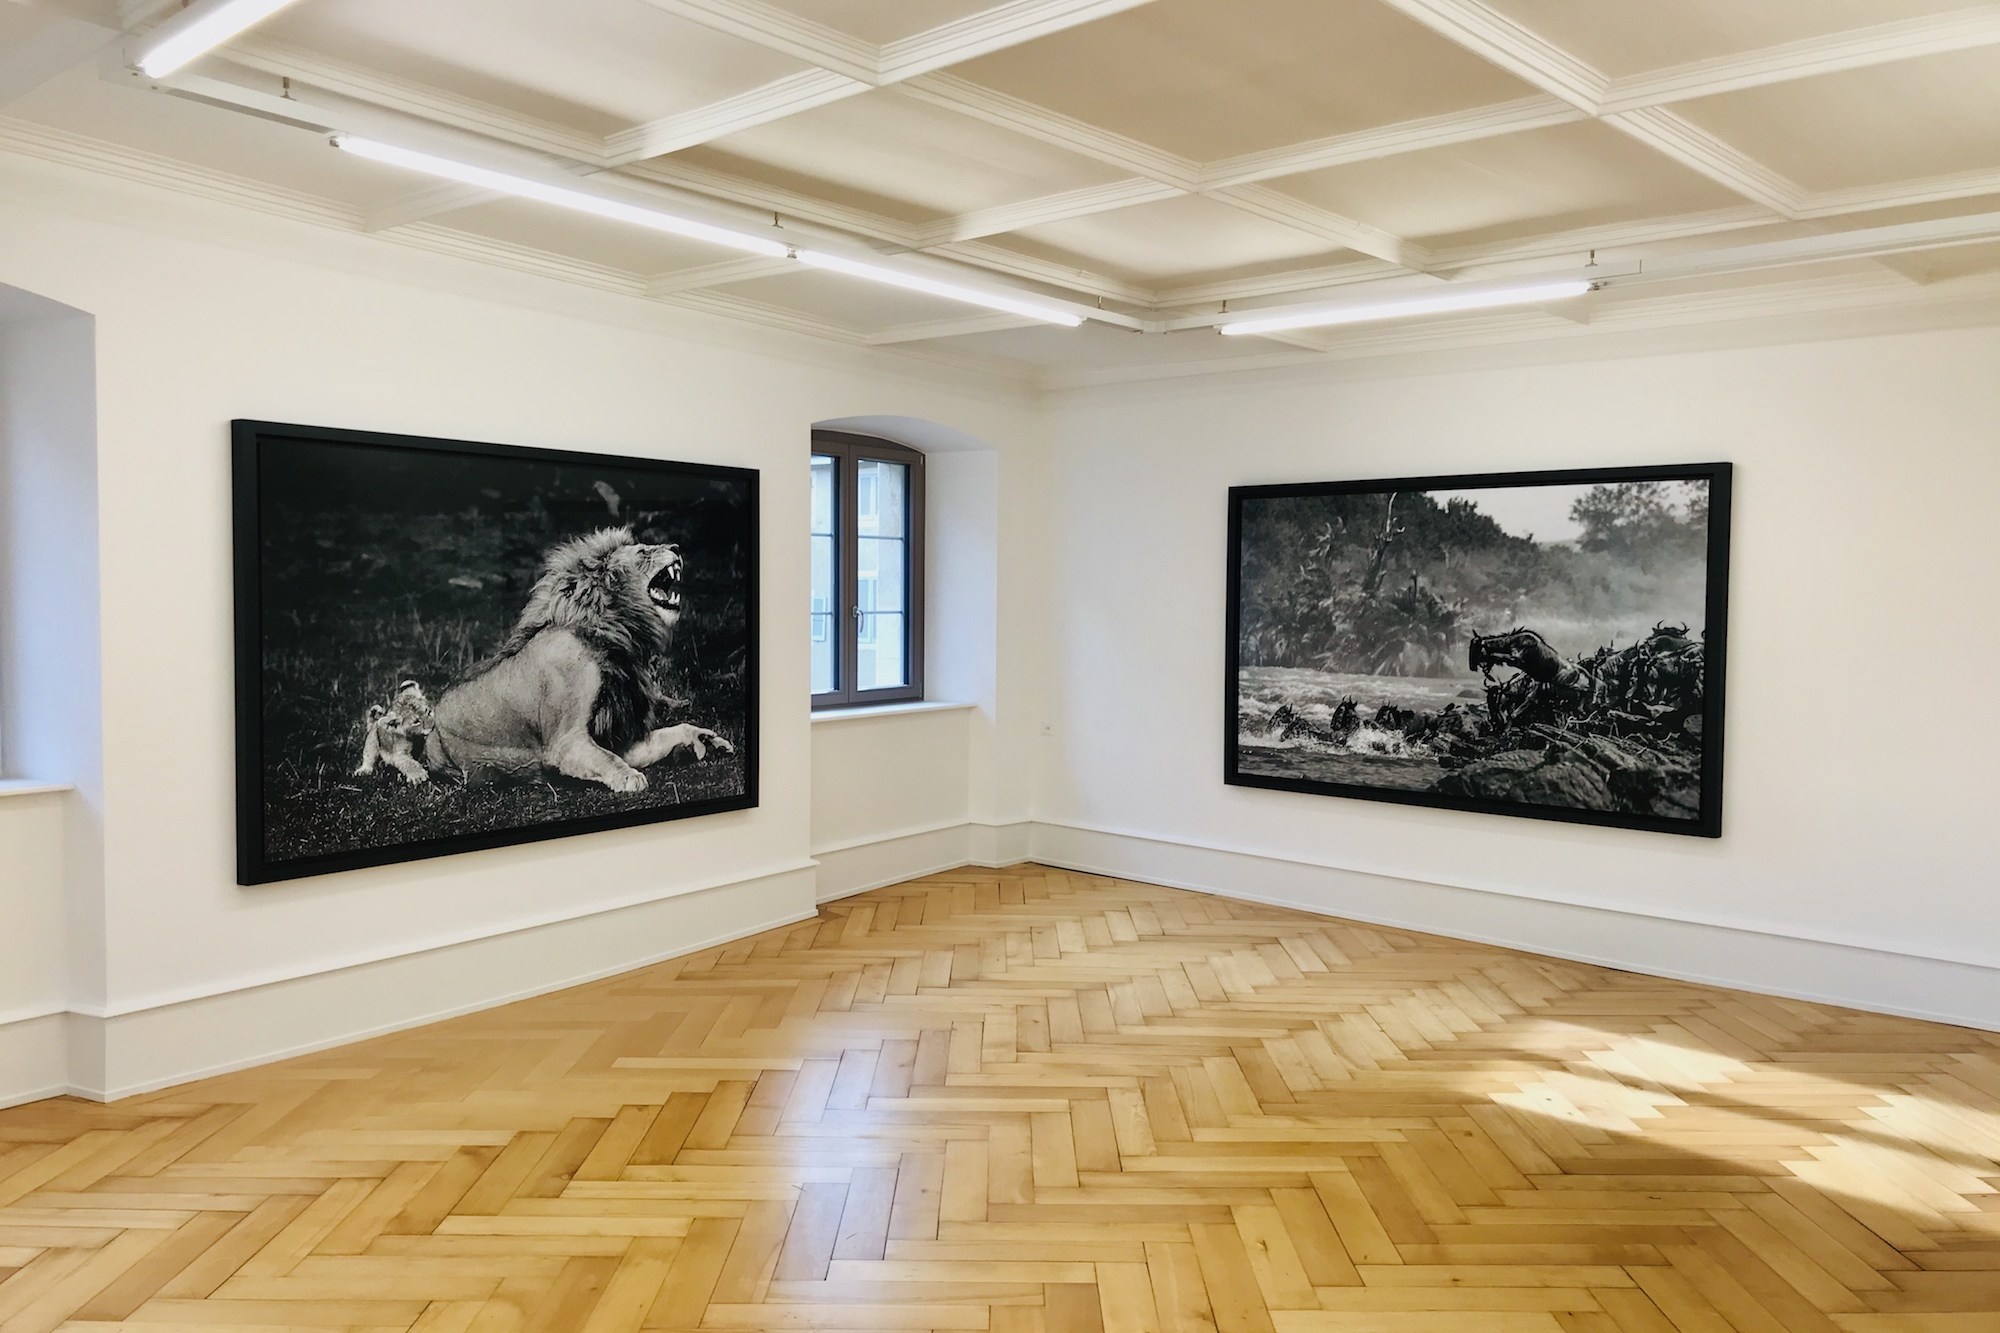 Exposition, Genève - Yann Arthus-Bertrand Photo